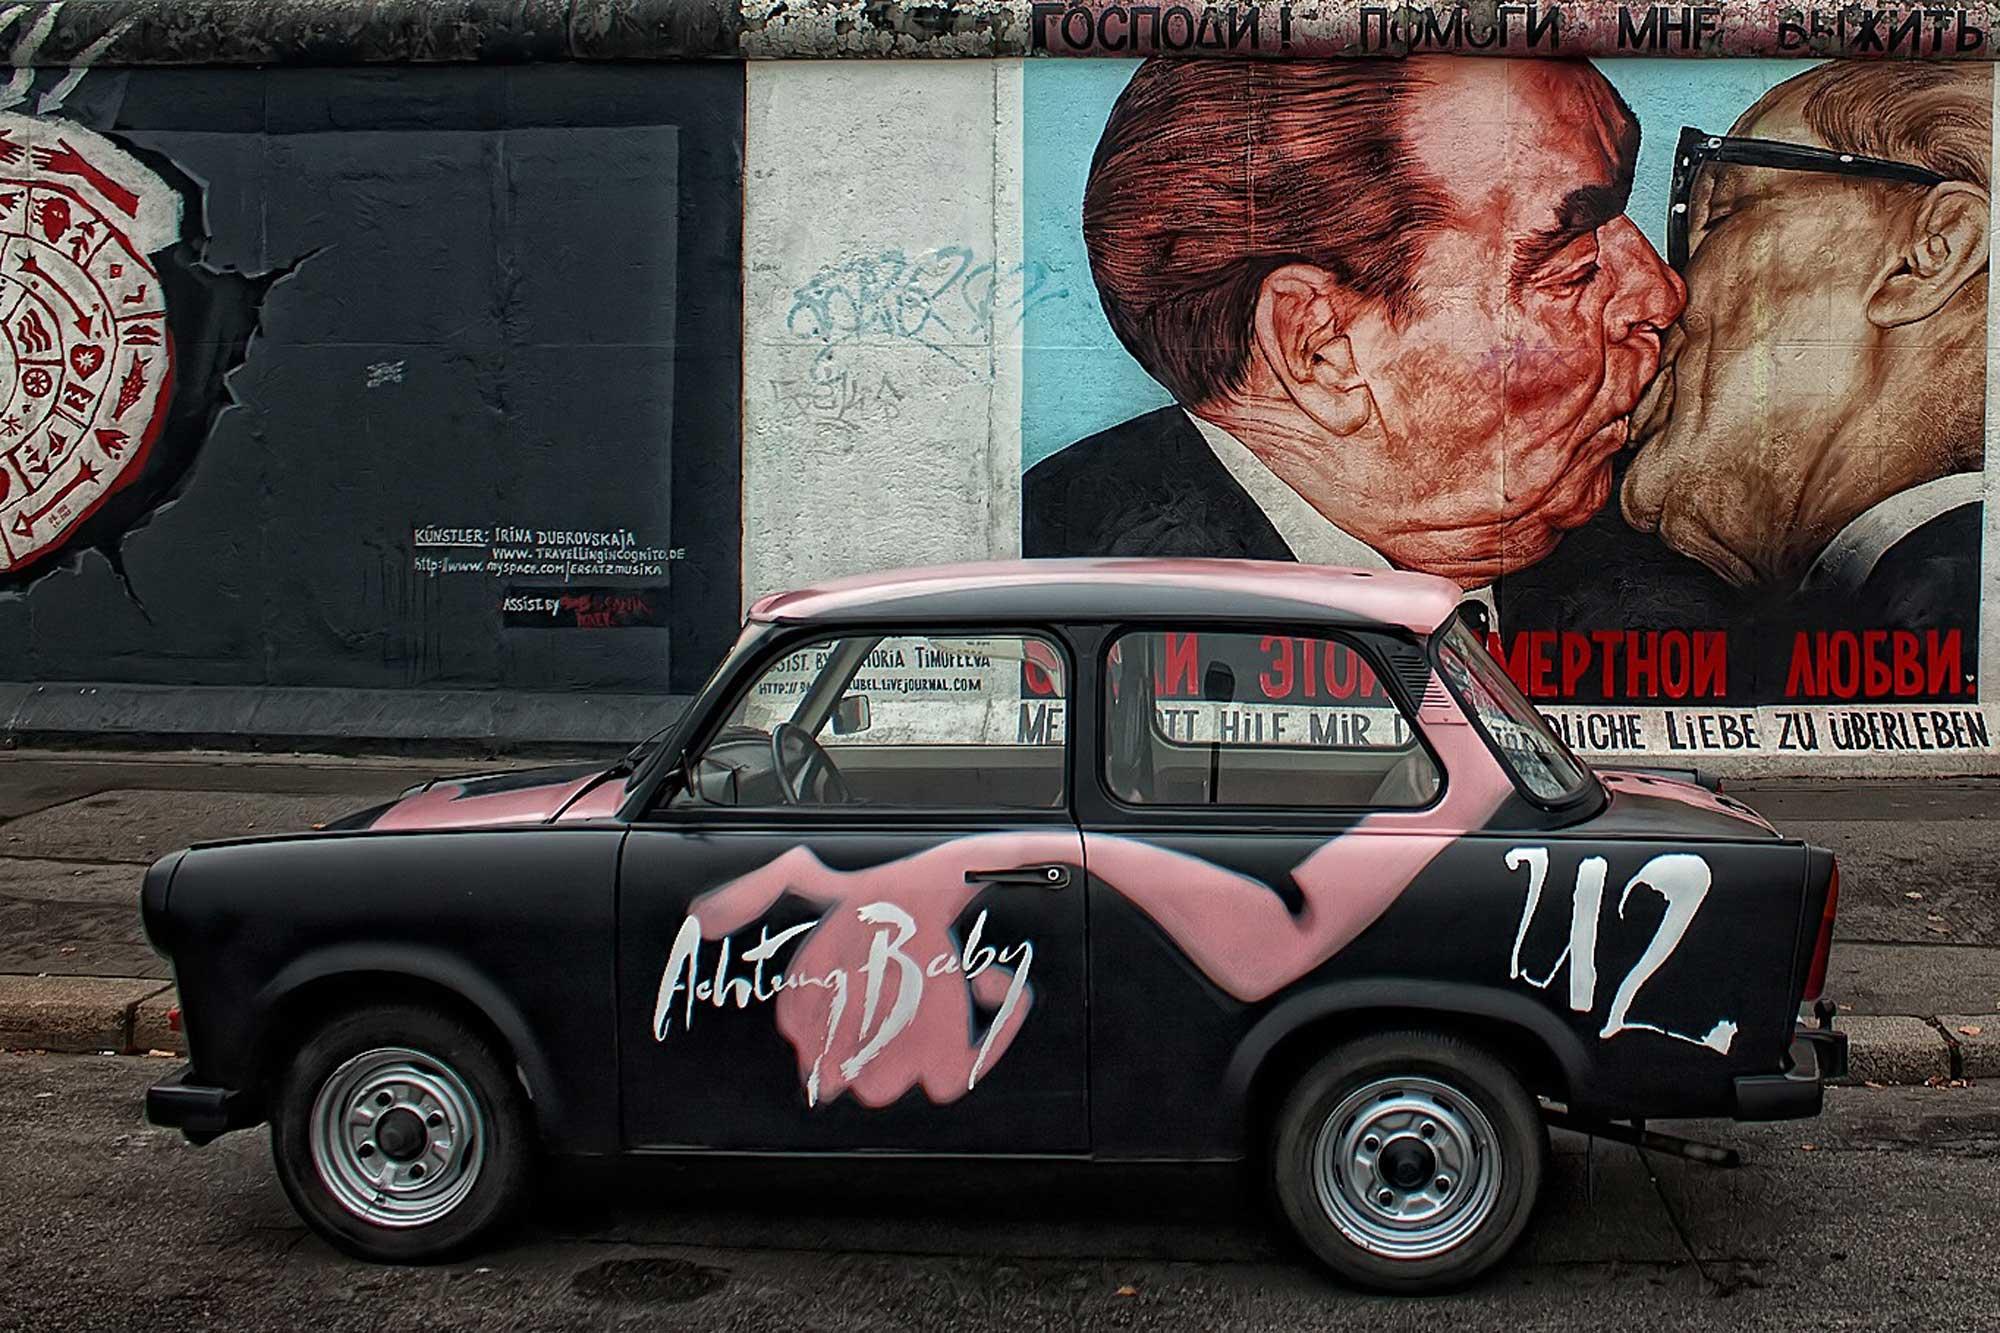 Zabrana Airbnb Berlin